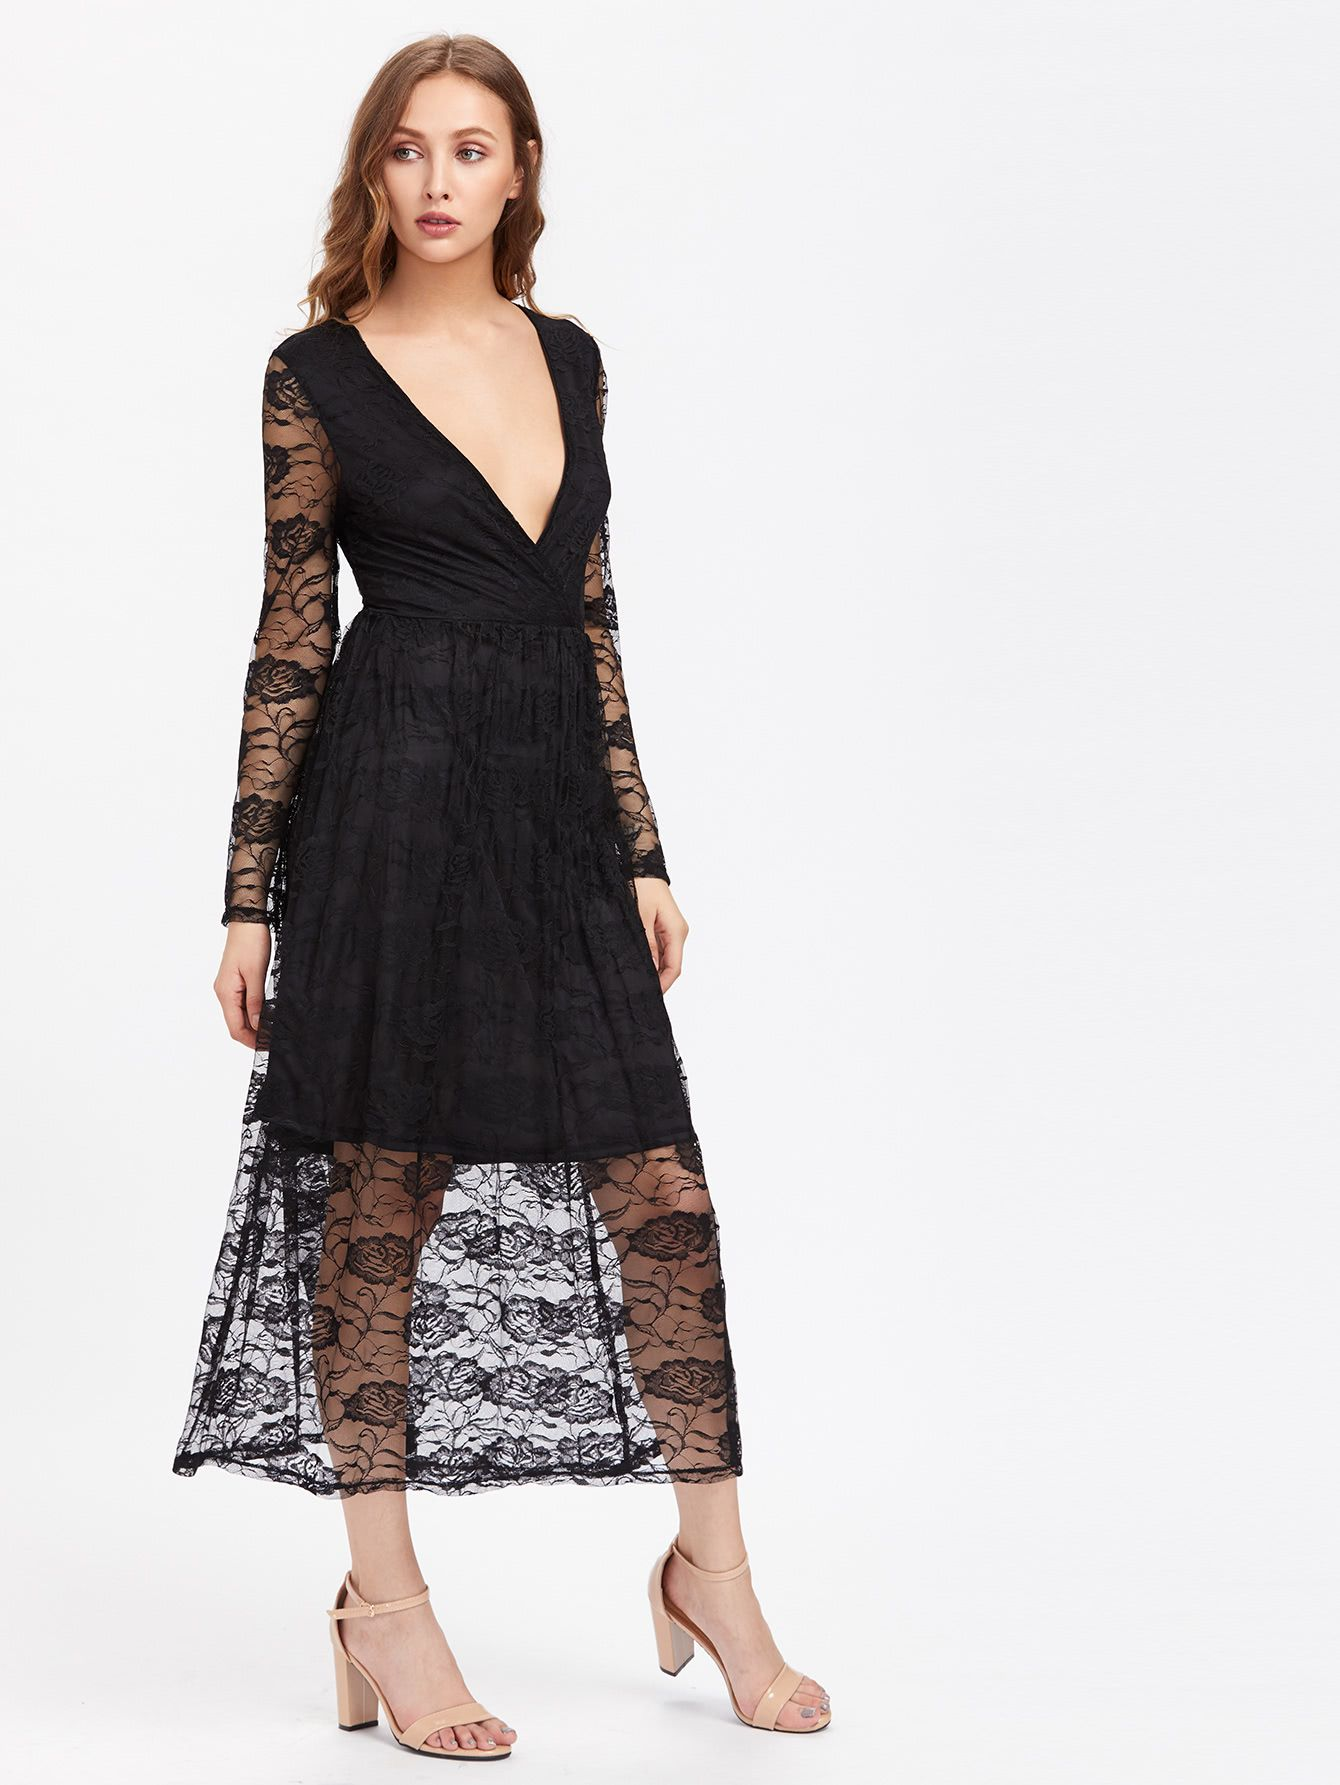 Plunging V Neckline Lace Dress Black Lace Midi Dress Lace Dress Lace Midi Dress [ 1785 x 1340 Pixel ]